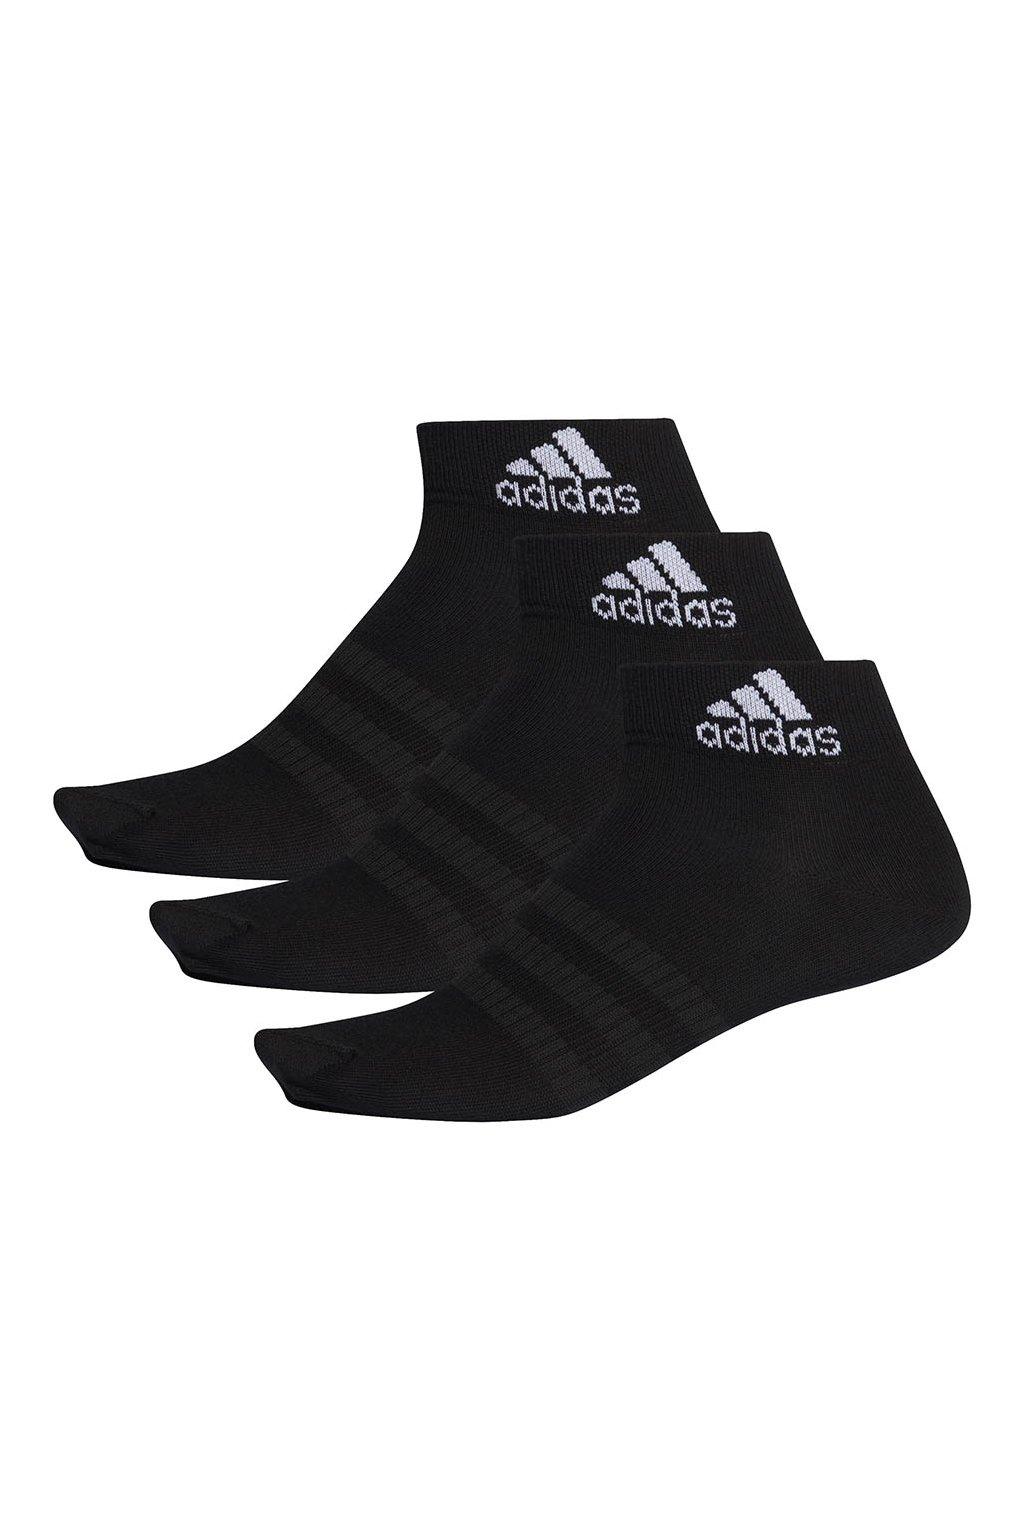 Ponožky adidas Light ANK 3PP čierne DZ9436